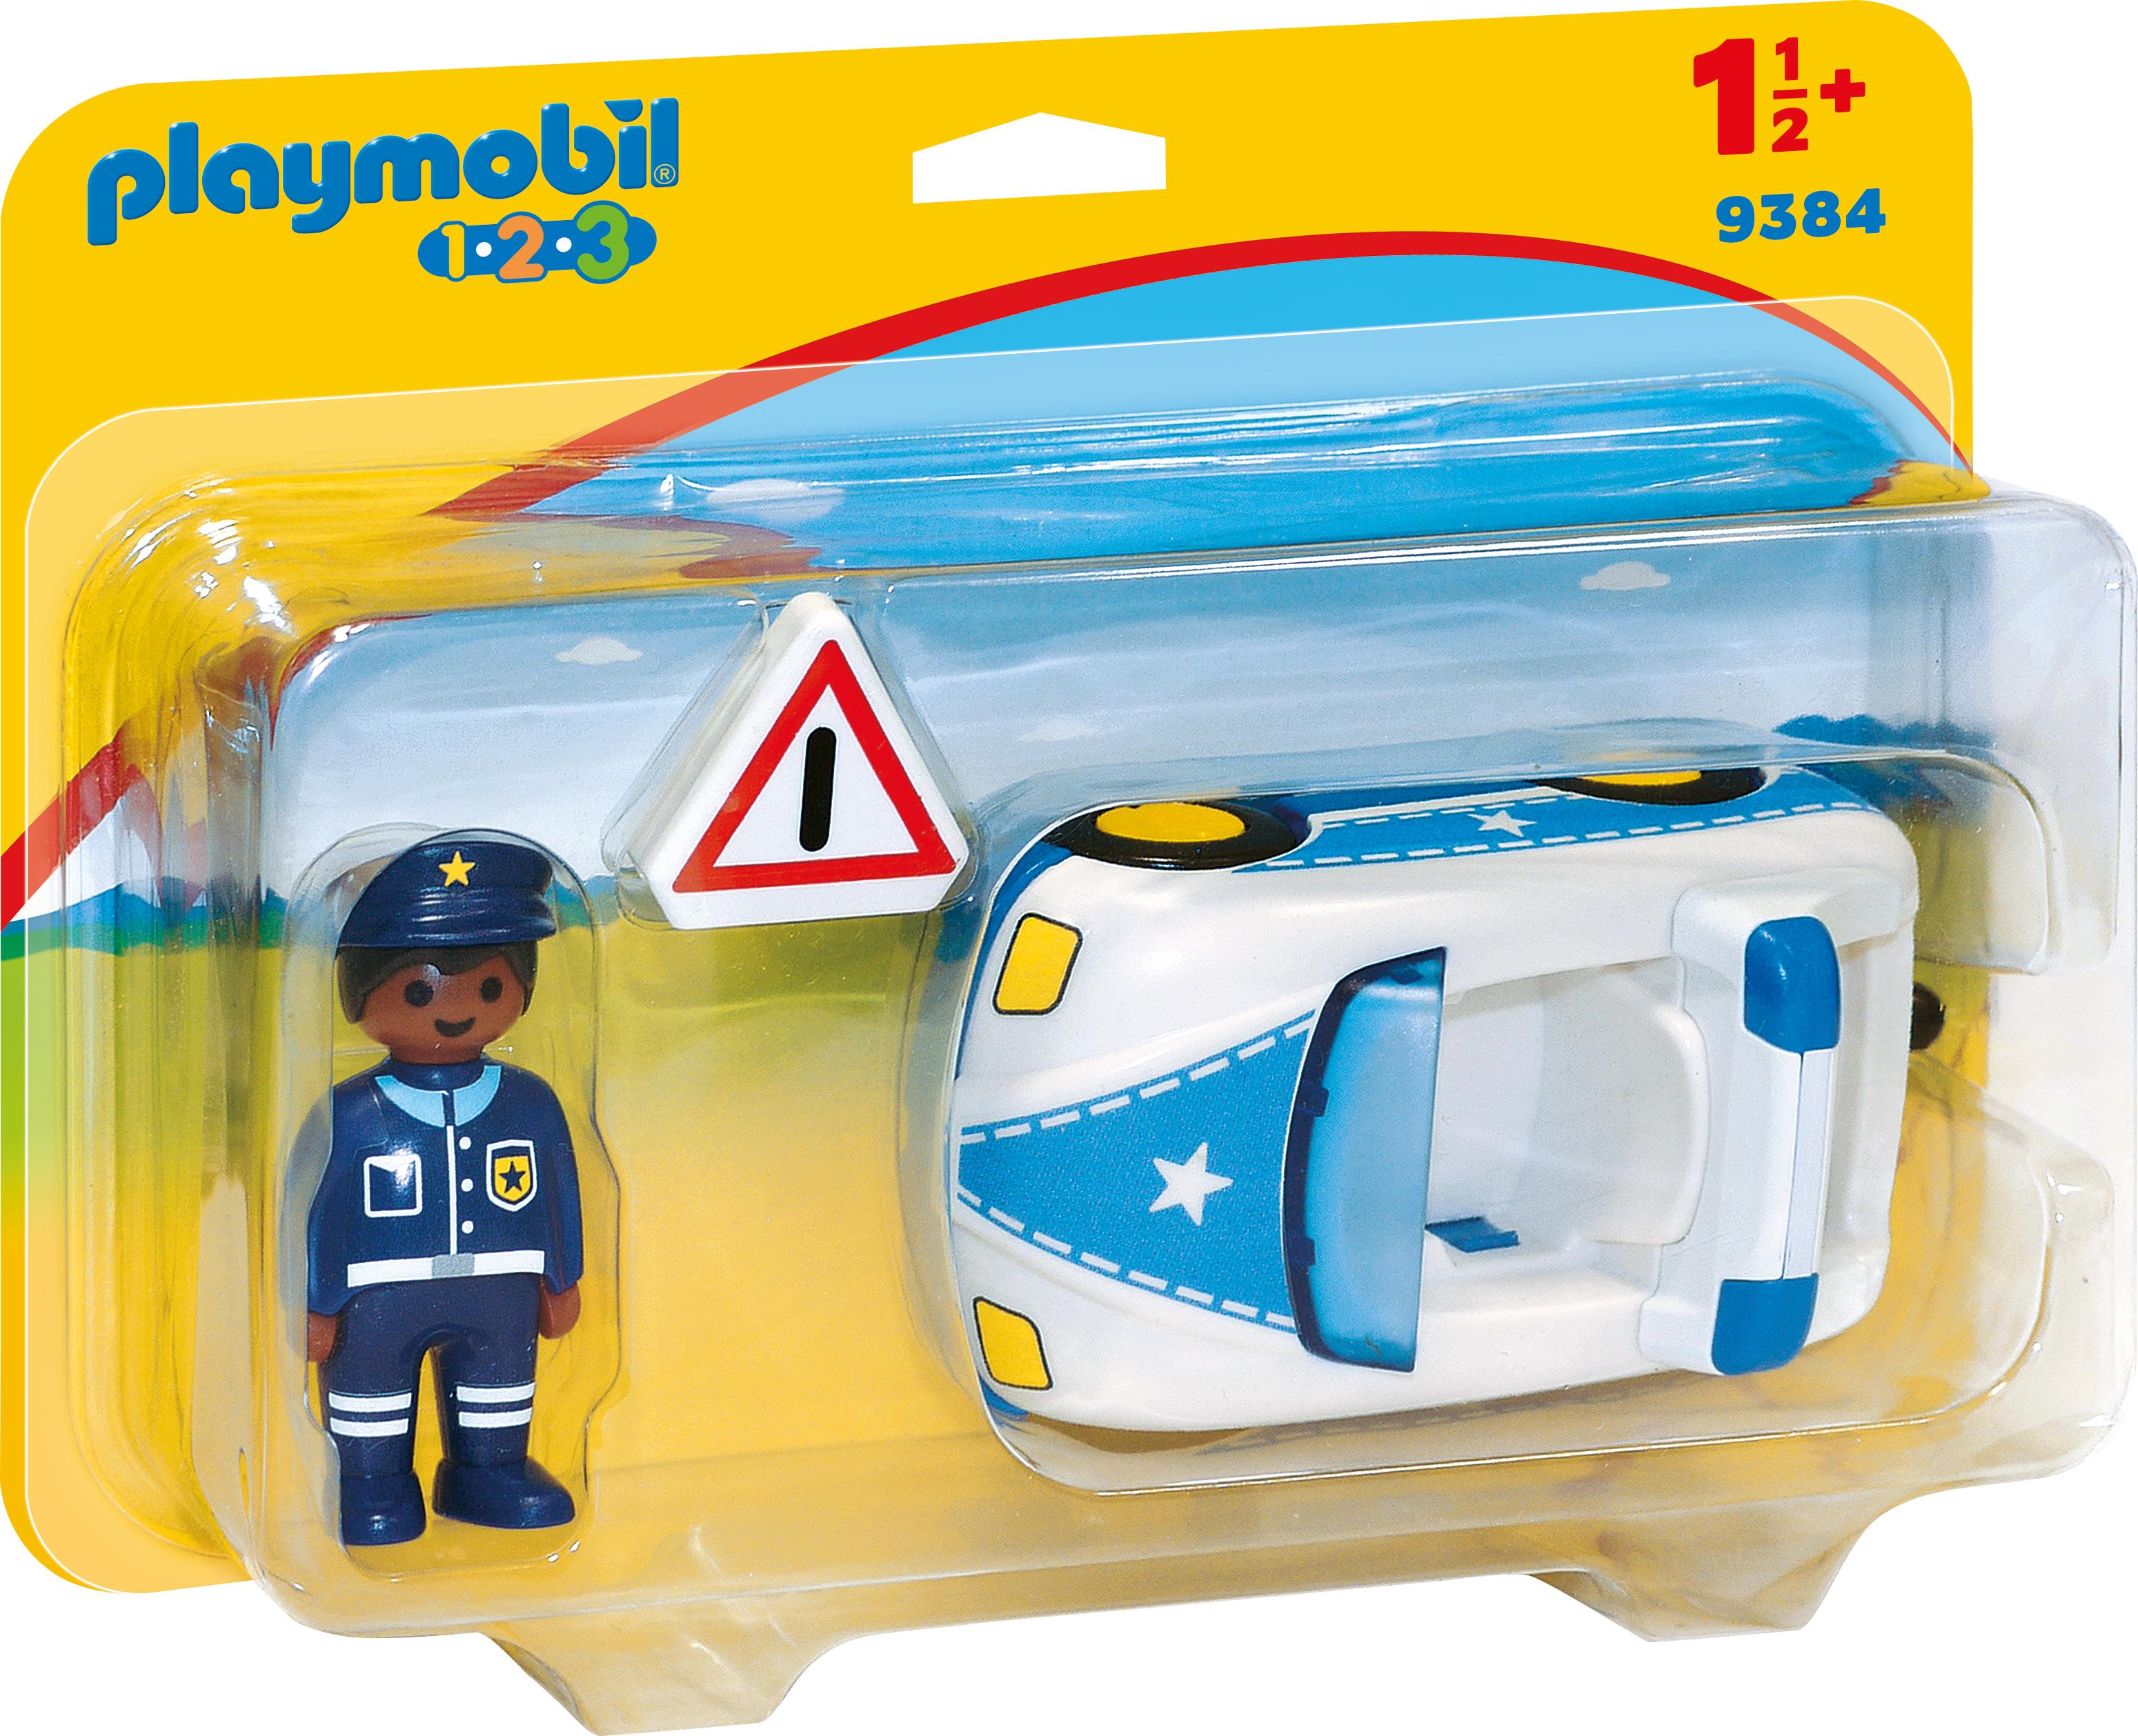 Masina de politie playmobil 1.2.3